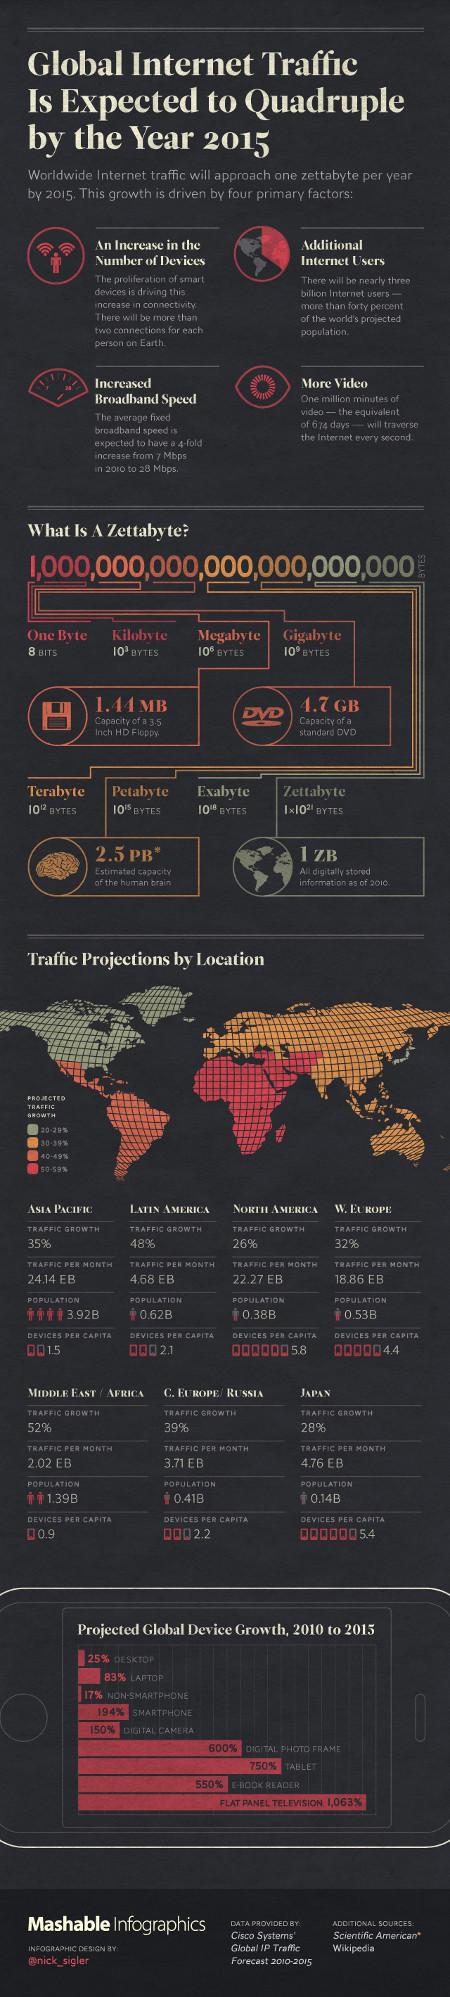 internet growth full - Le traffic Internet global devrait quadrupler d'ici 2015! [Infographique]